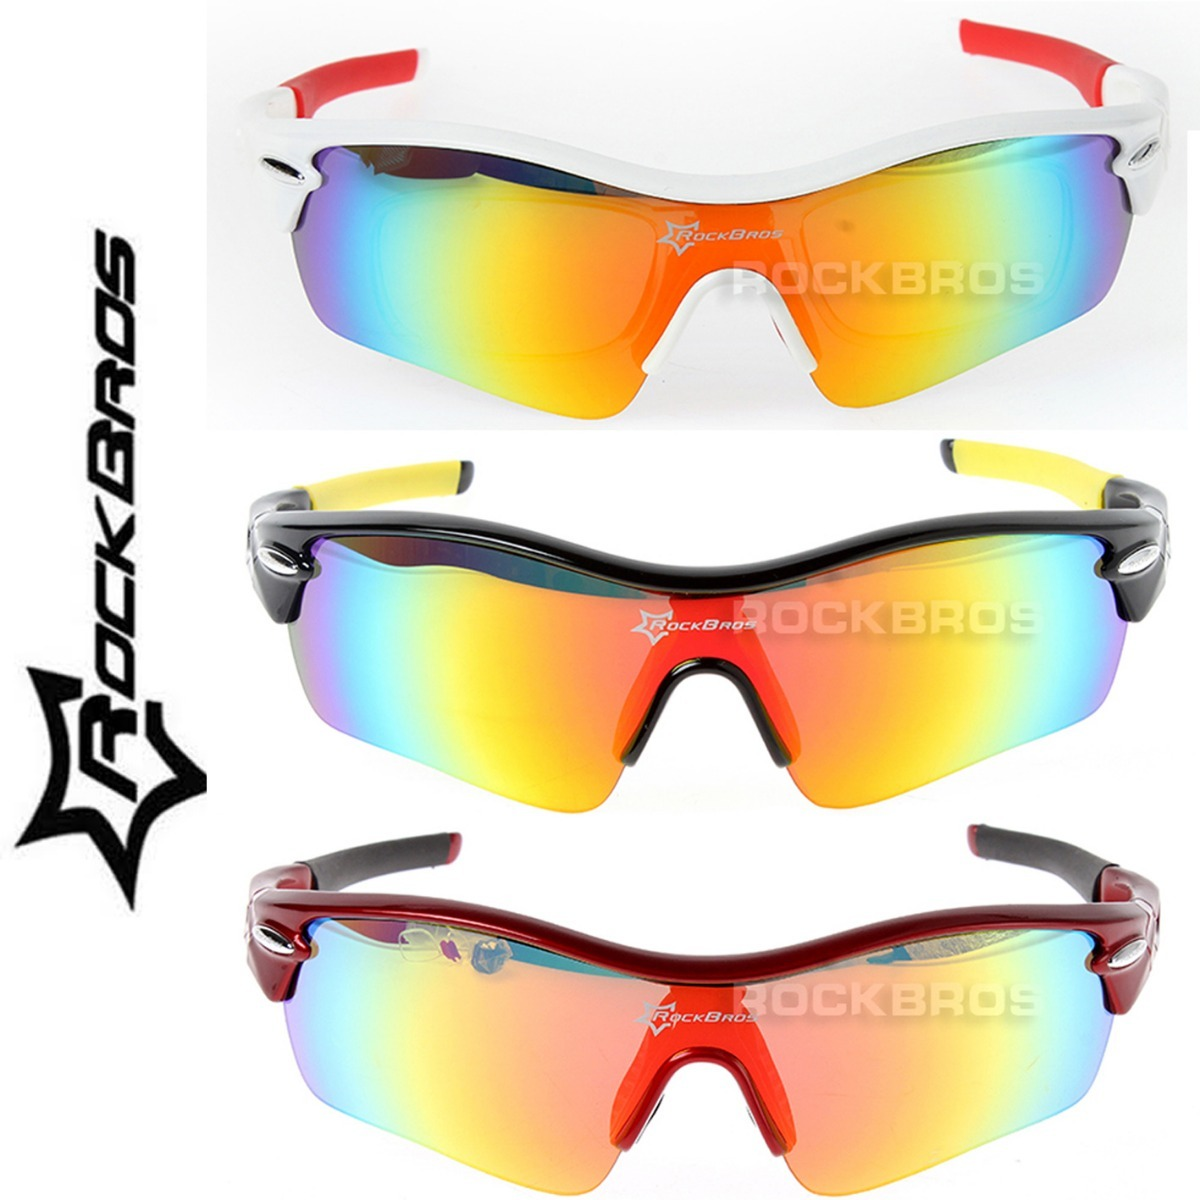 óculos rockbros original polarizado ciclismo 5 lentes uv400. Carregando  zoom. 9001ef2769